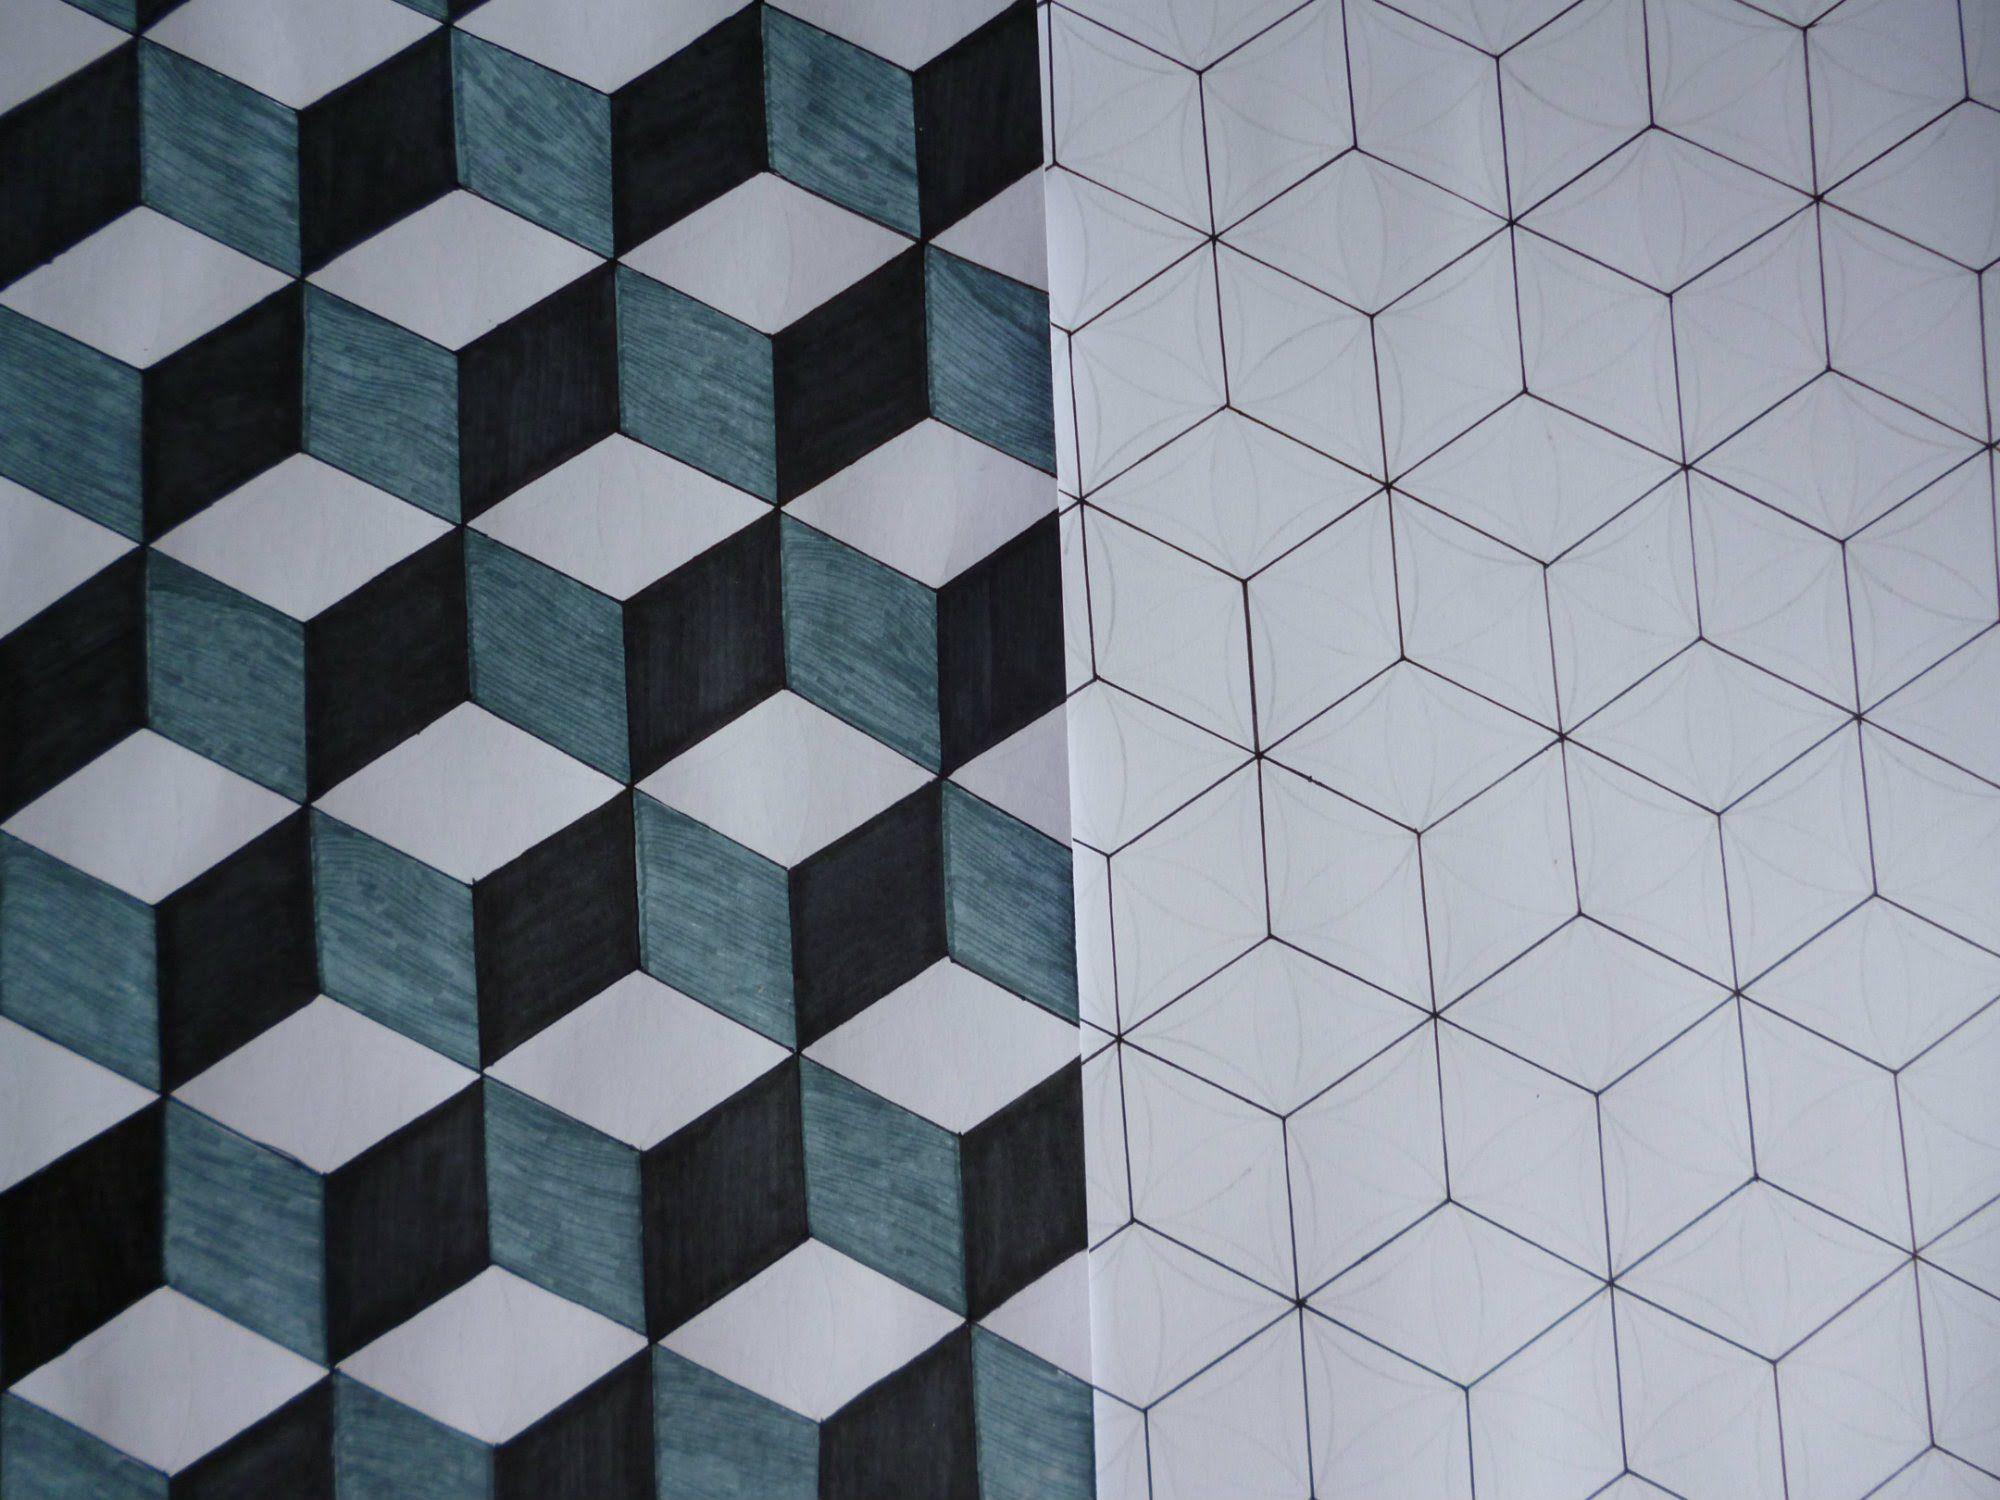 Diy Cube Pattern Art Cube Tessellation Art Geometric Art